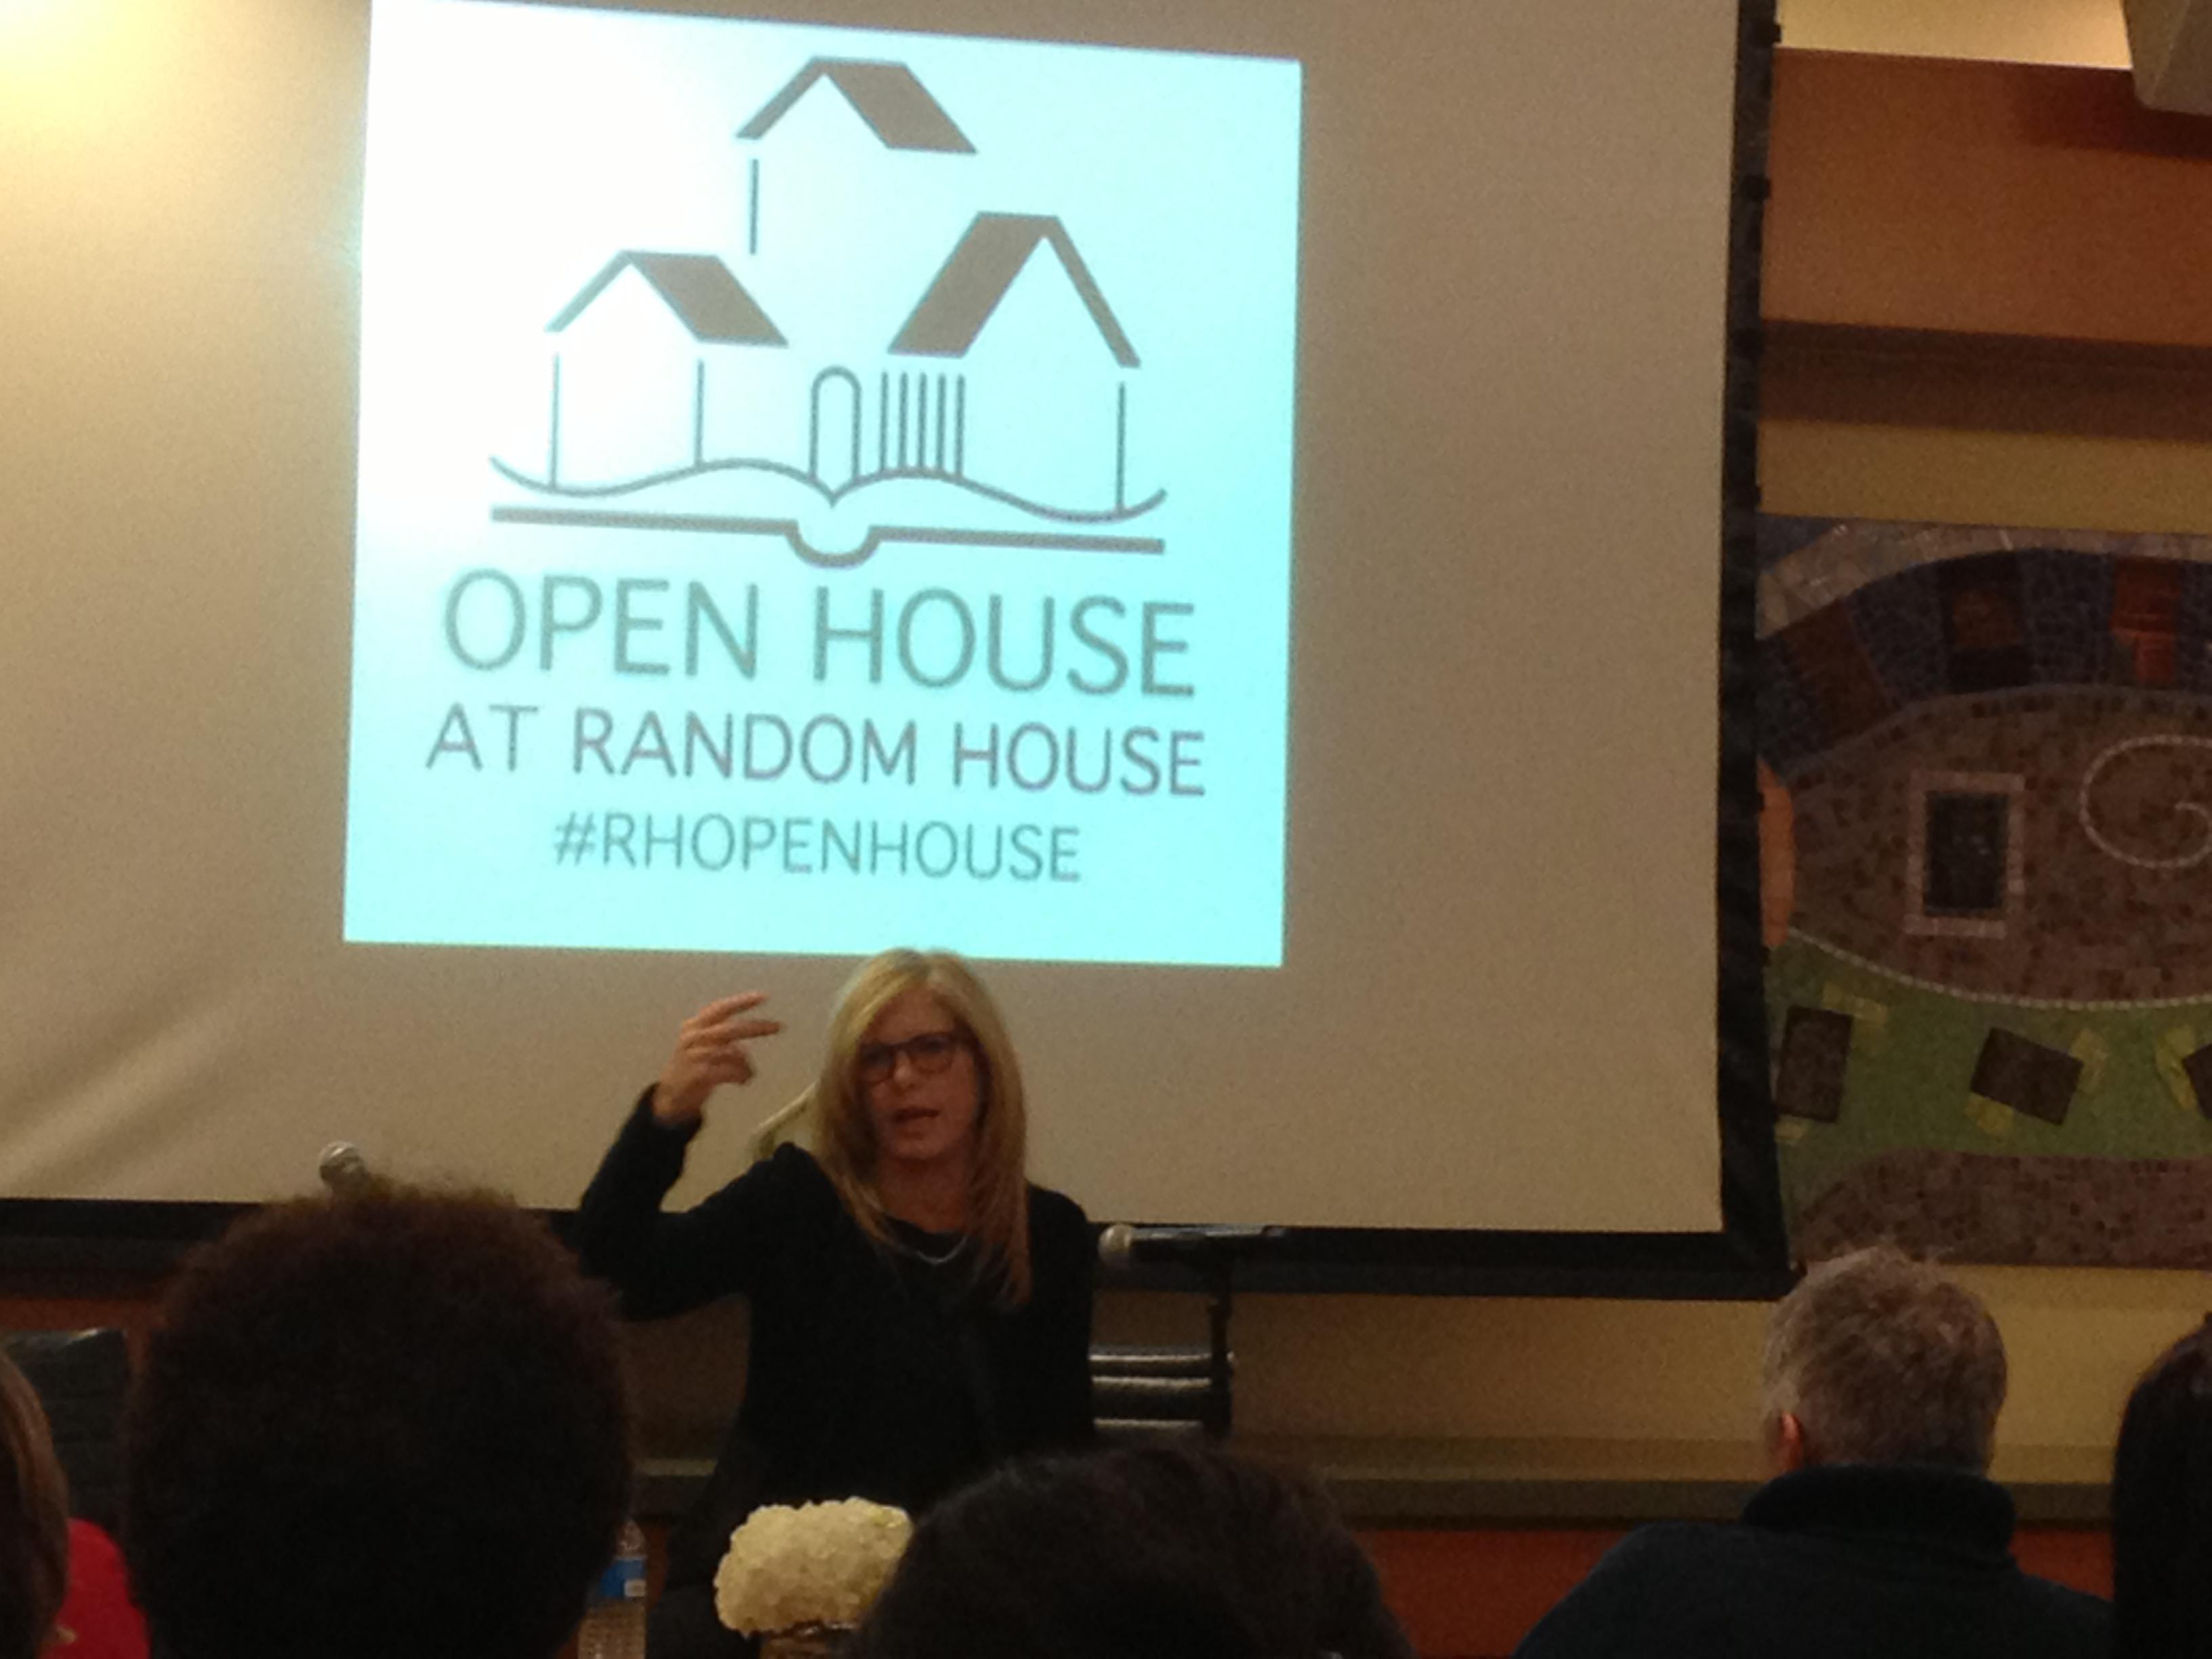 open-house-random-house-lucy-danziger4